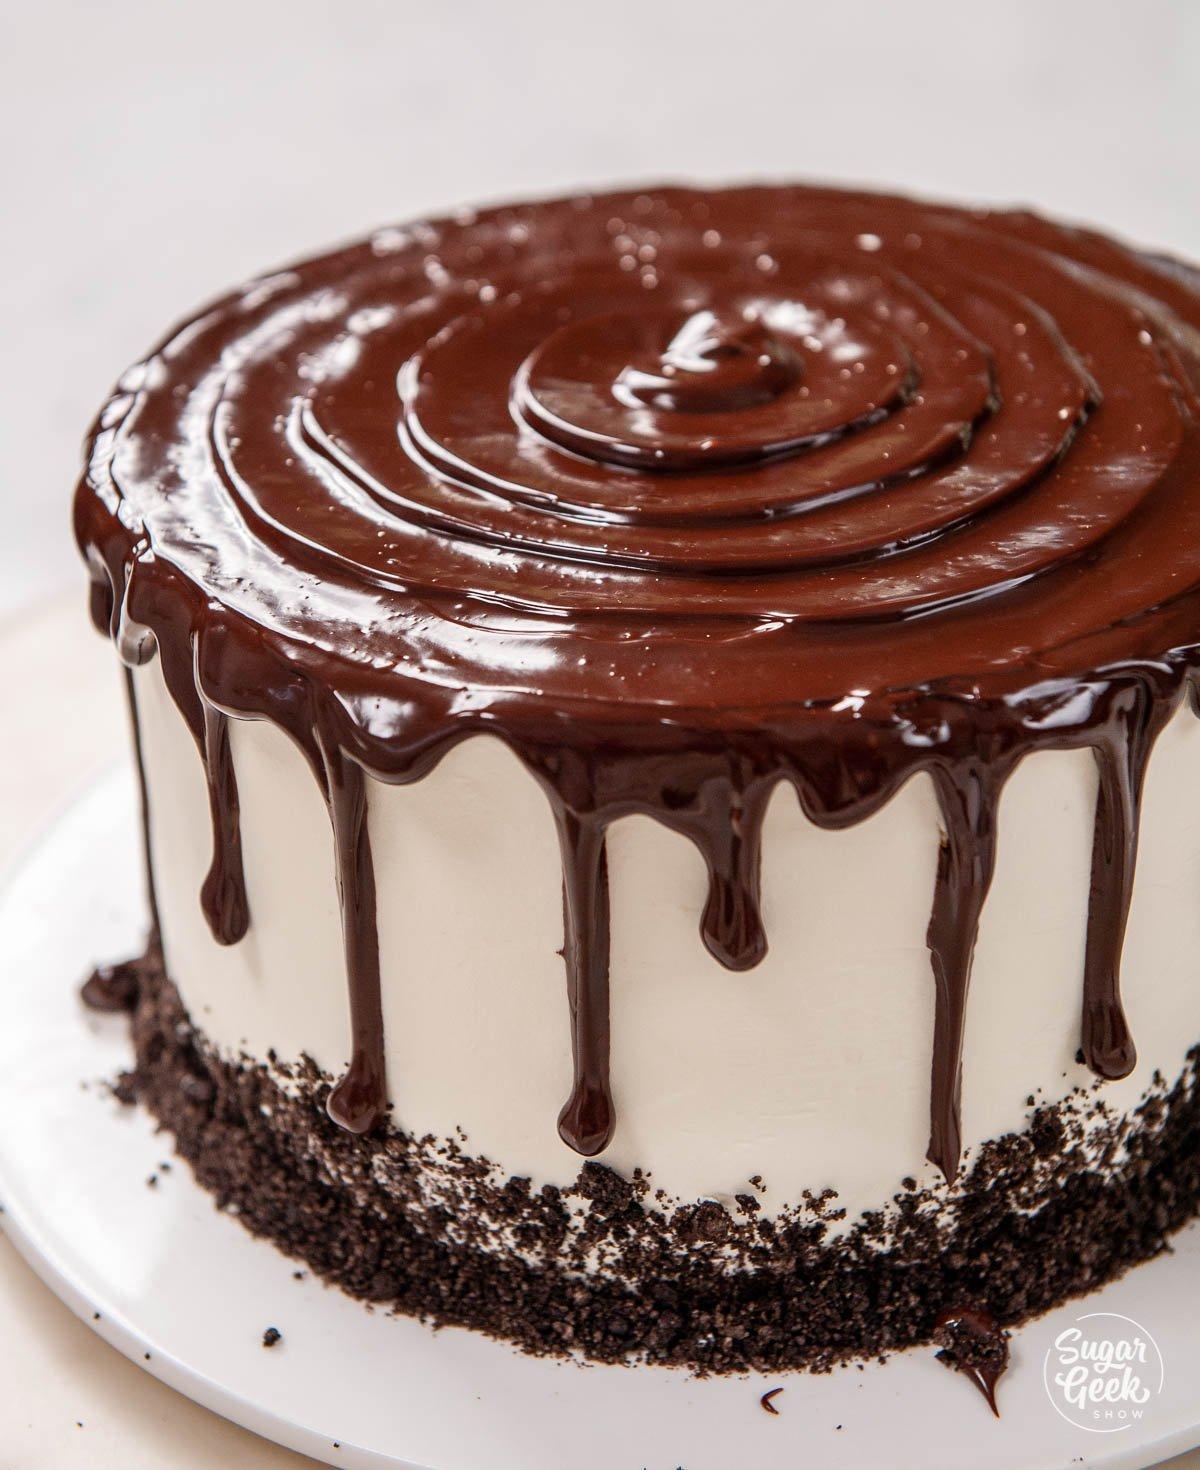 closeup of chocolate ganache drip on an ice cream cake